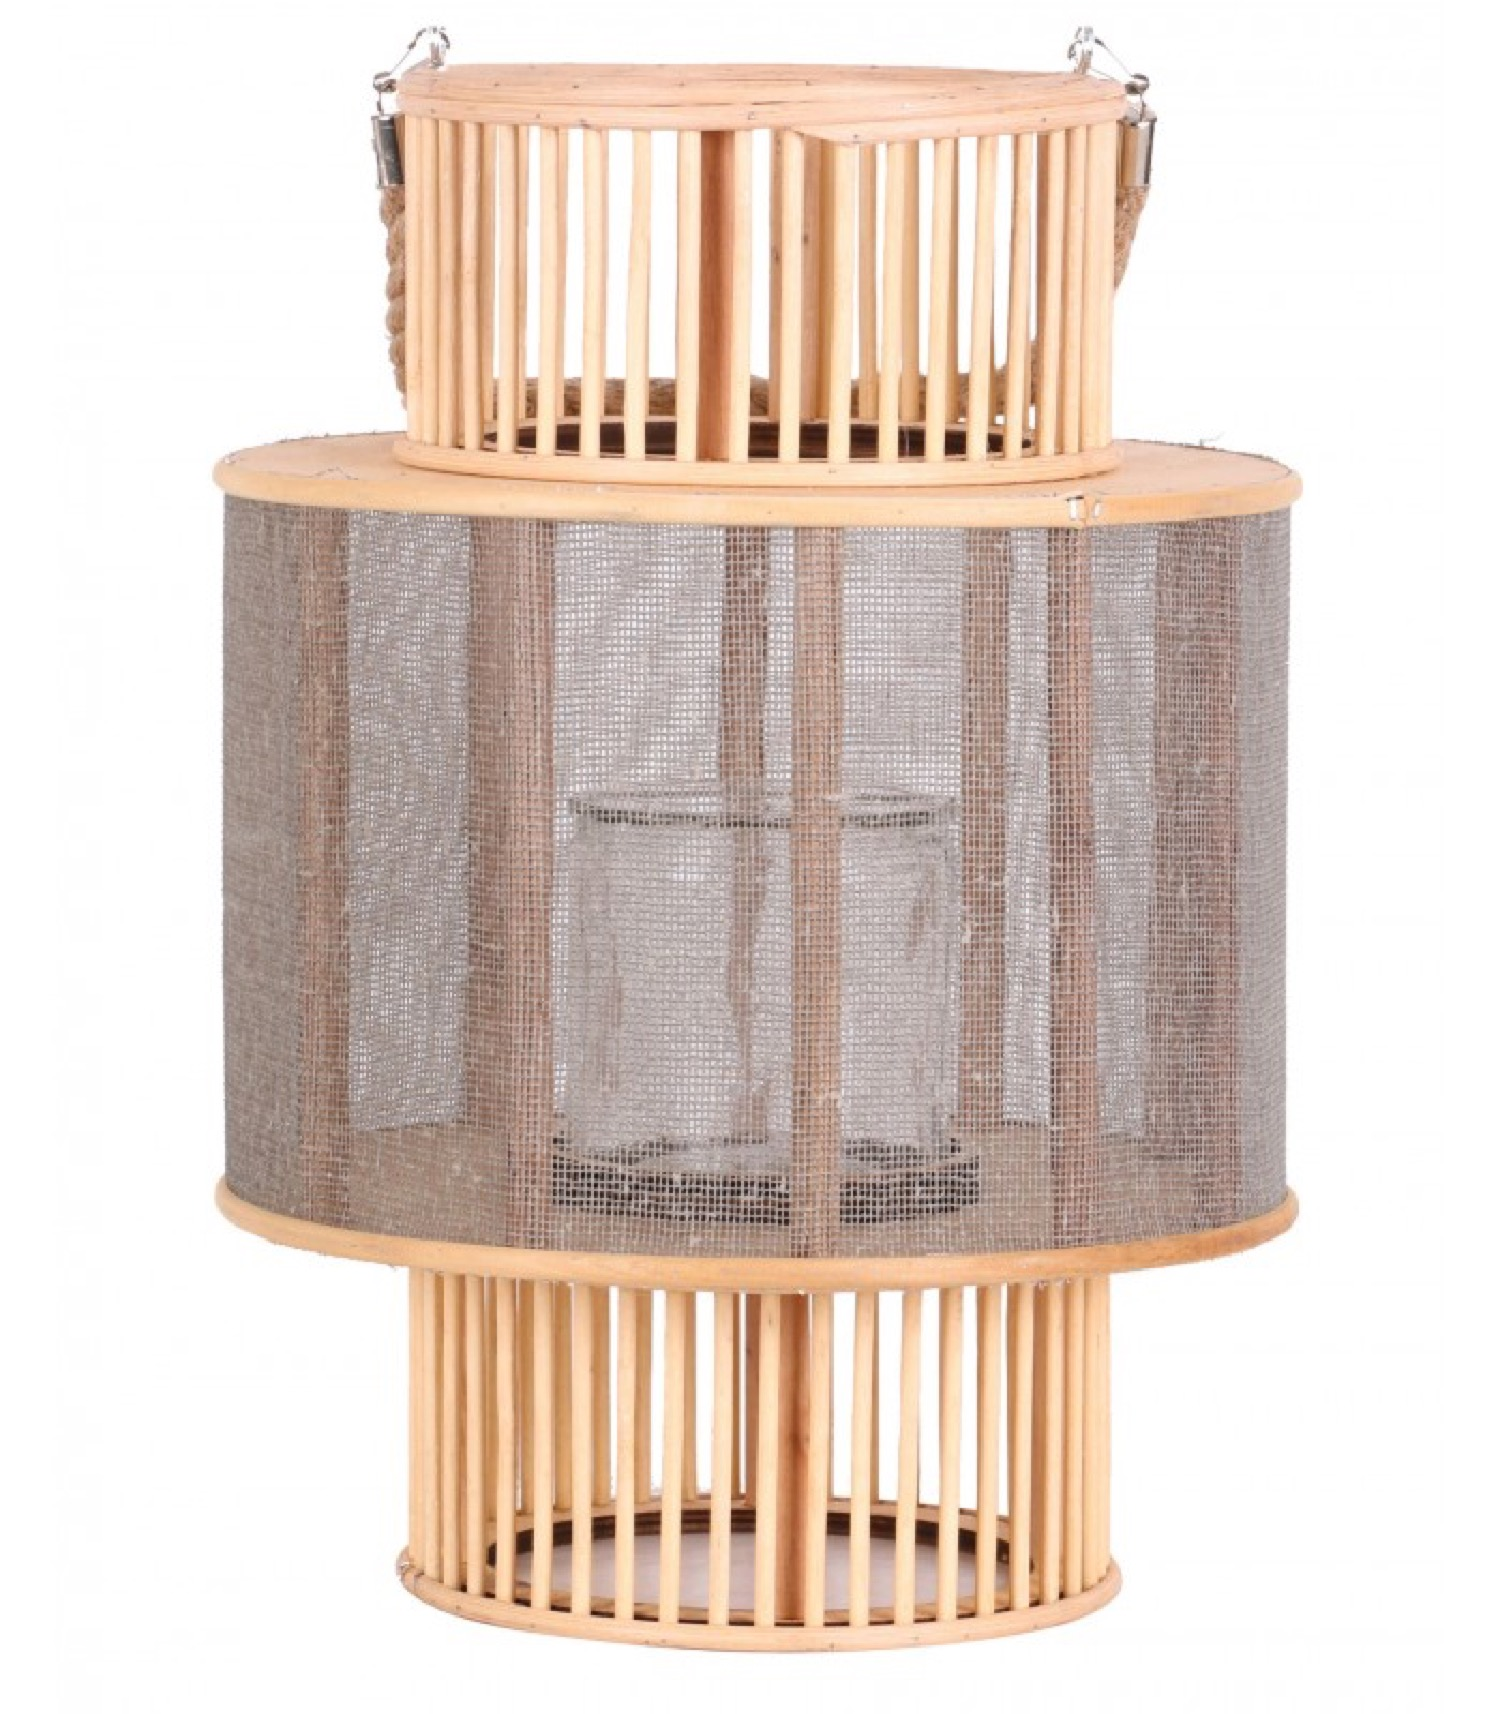 Lanterne ronde en bois et bougeoir en verre H38cm